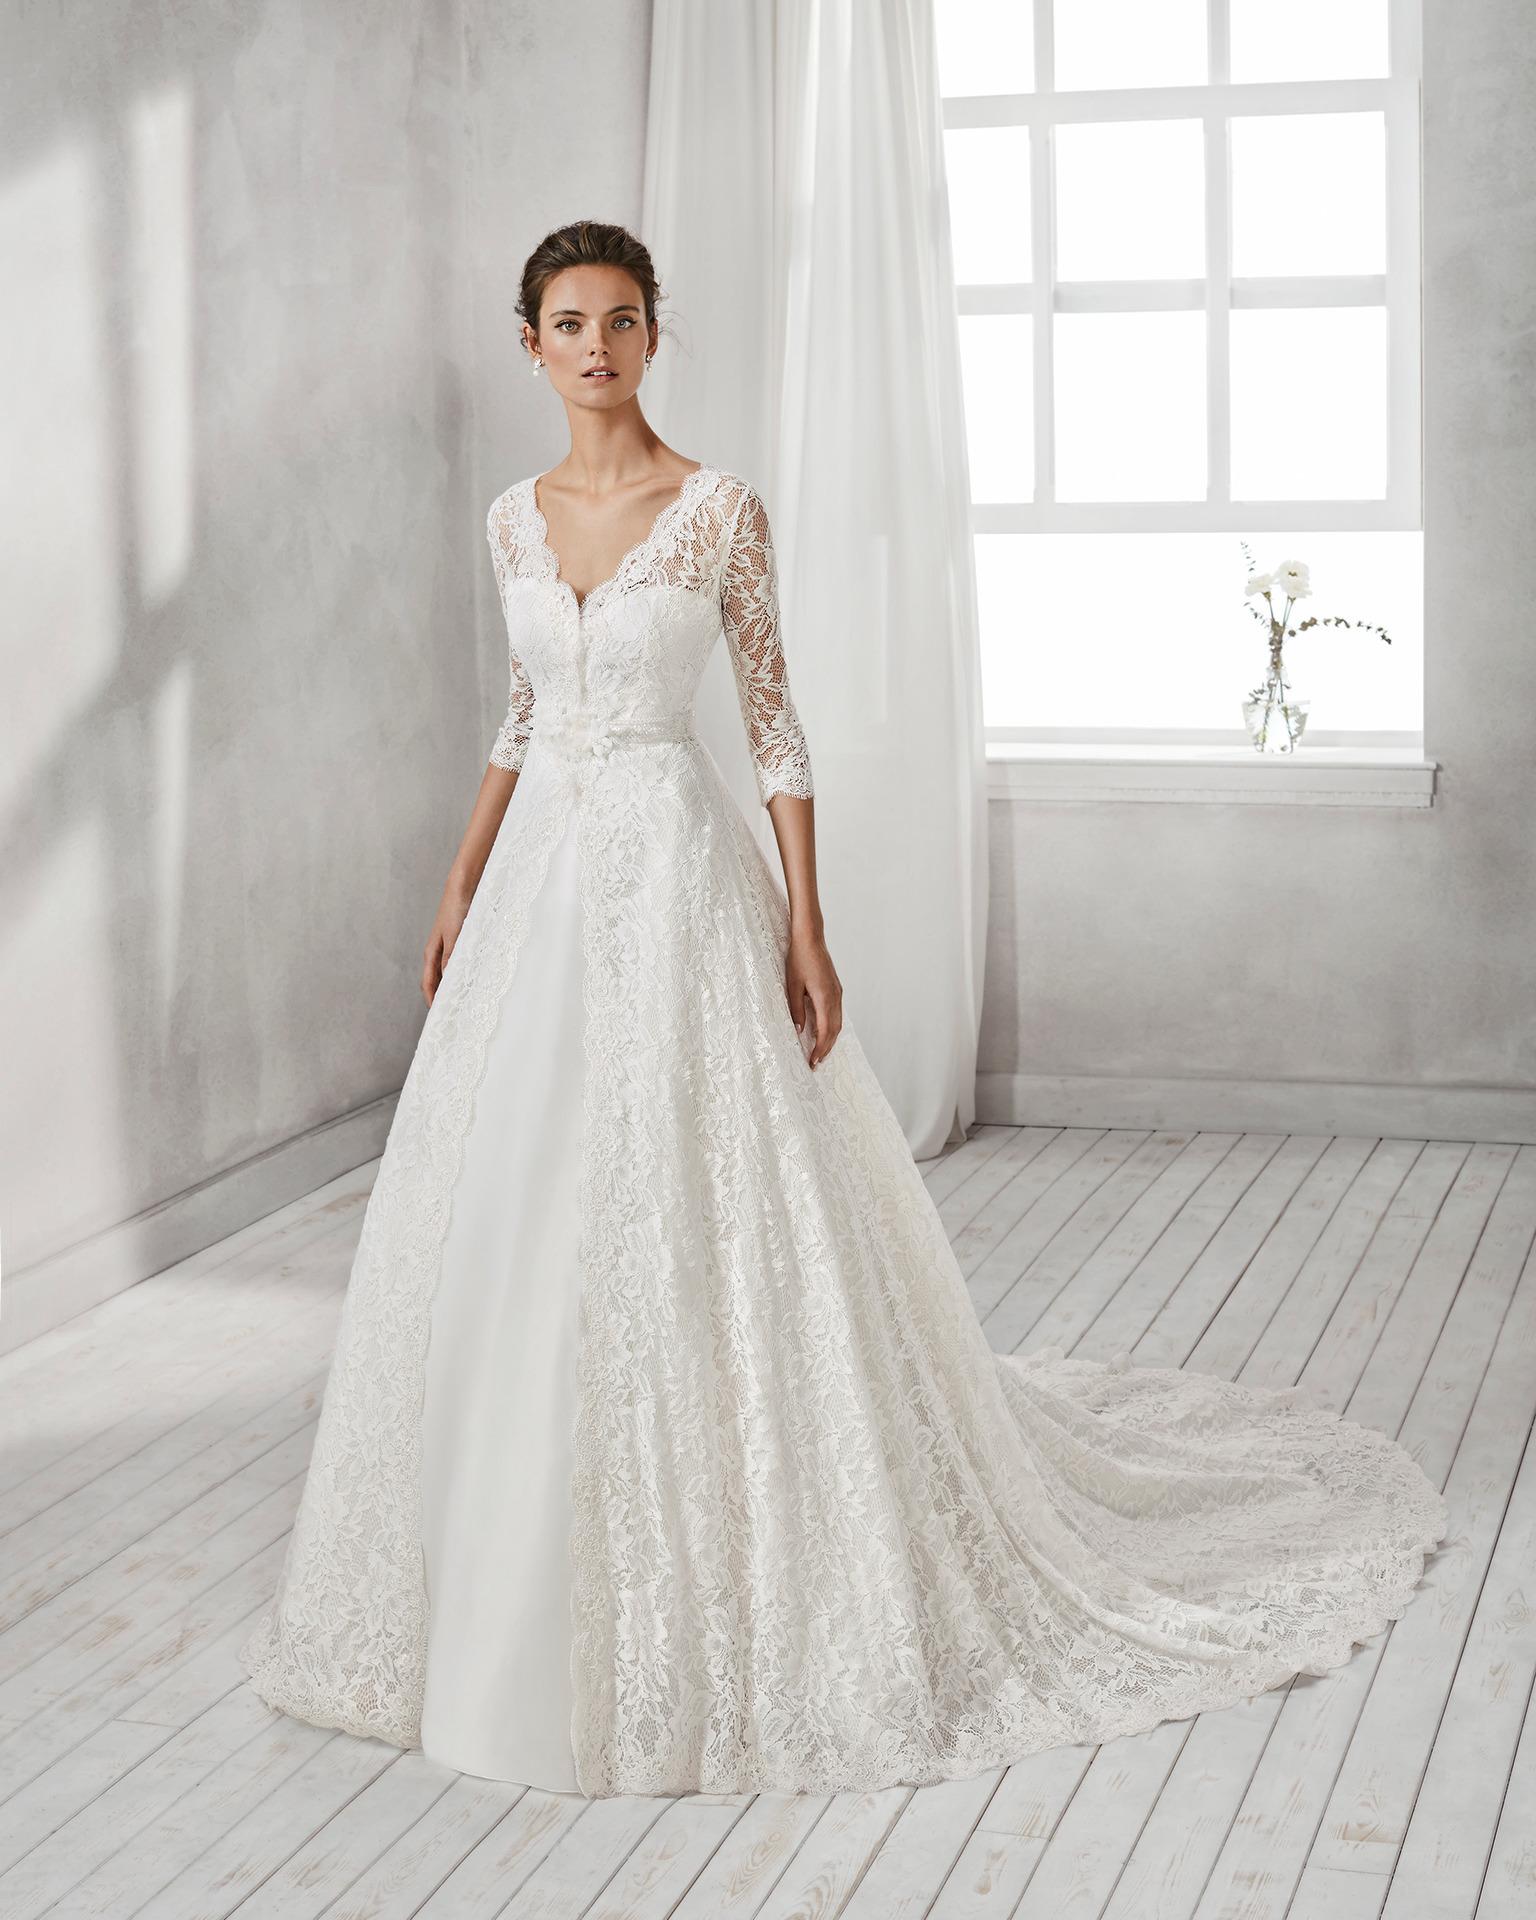 1d5495083a44 Exkluzívny svadobný salón - svadobné šaty Hesel